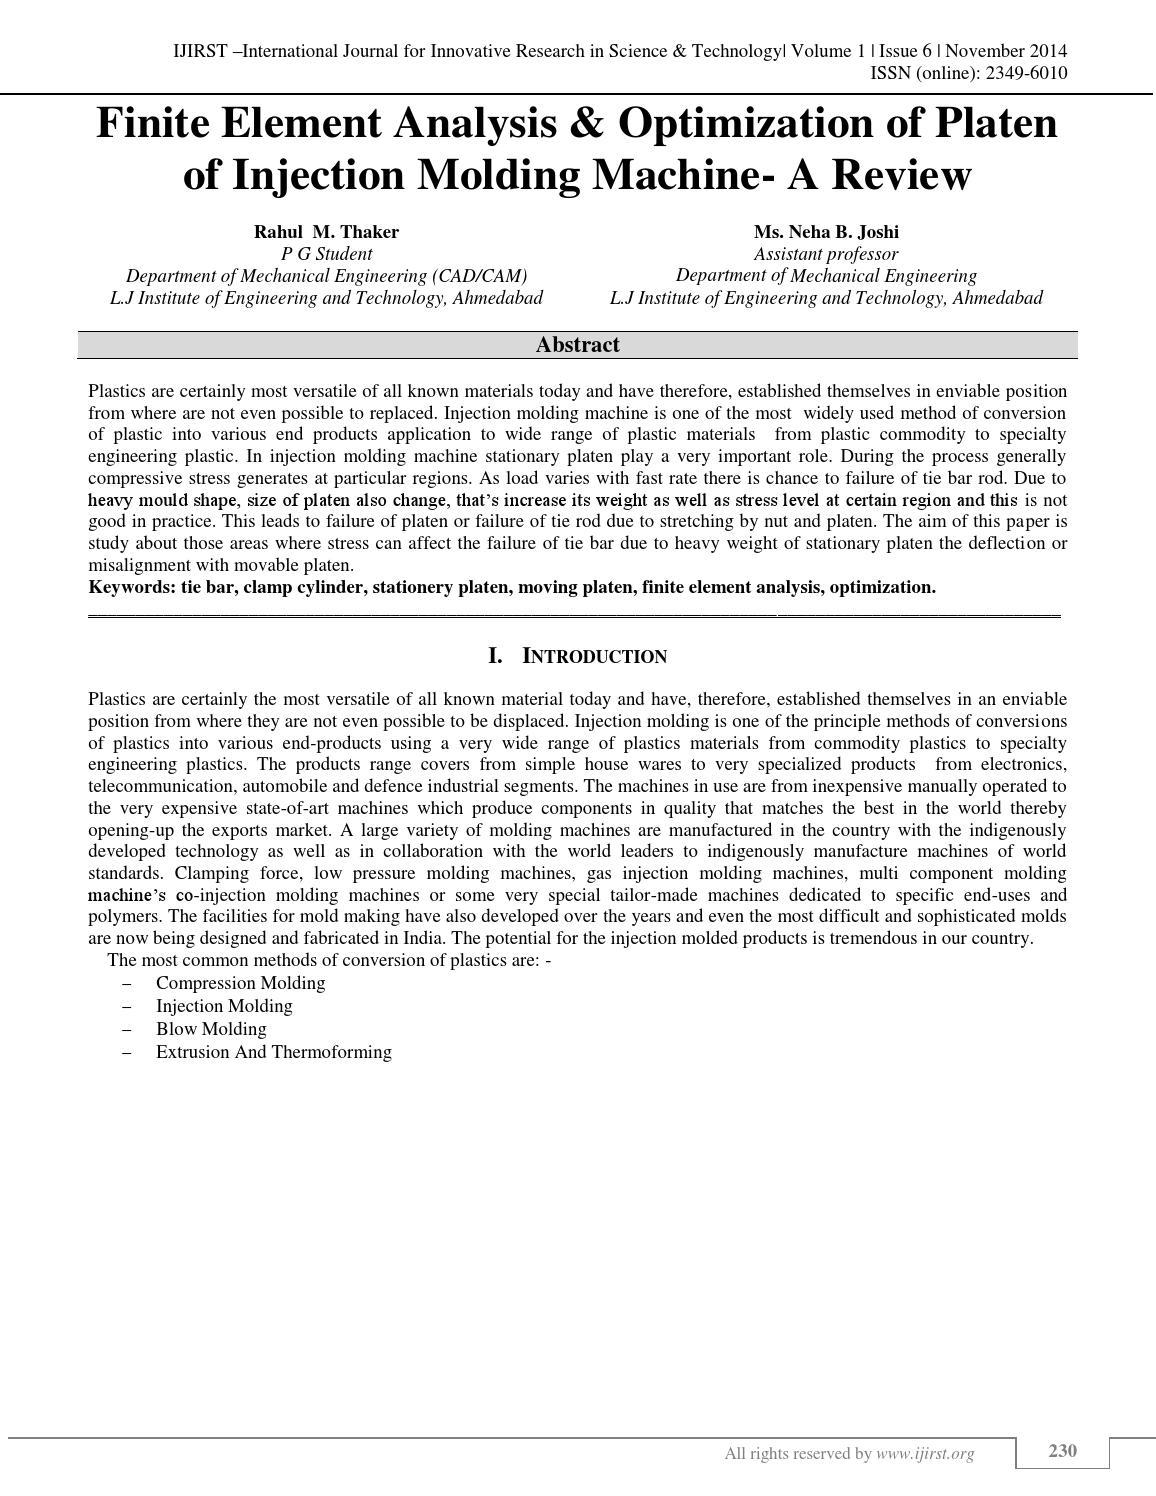 inite Element Analysis & Optimization of Platen of Injection